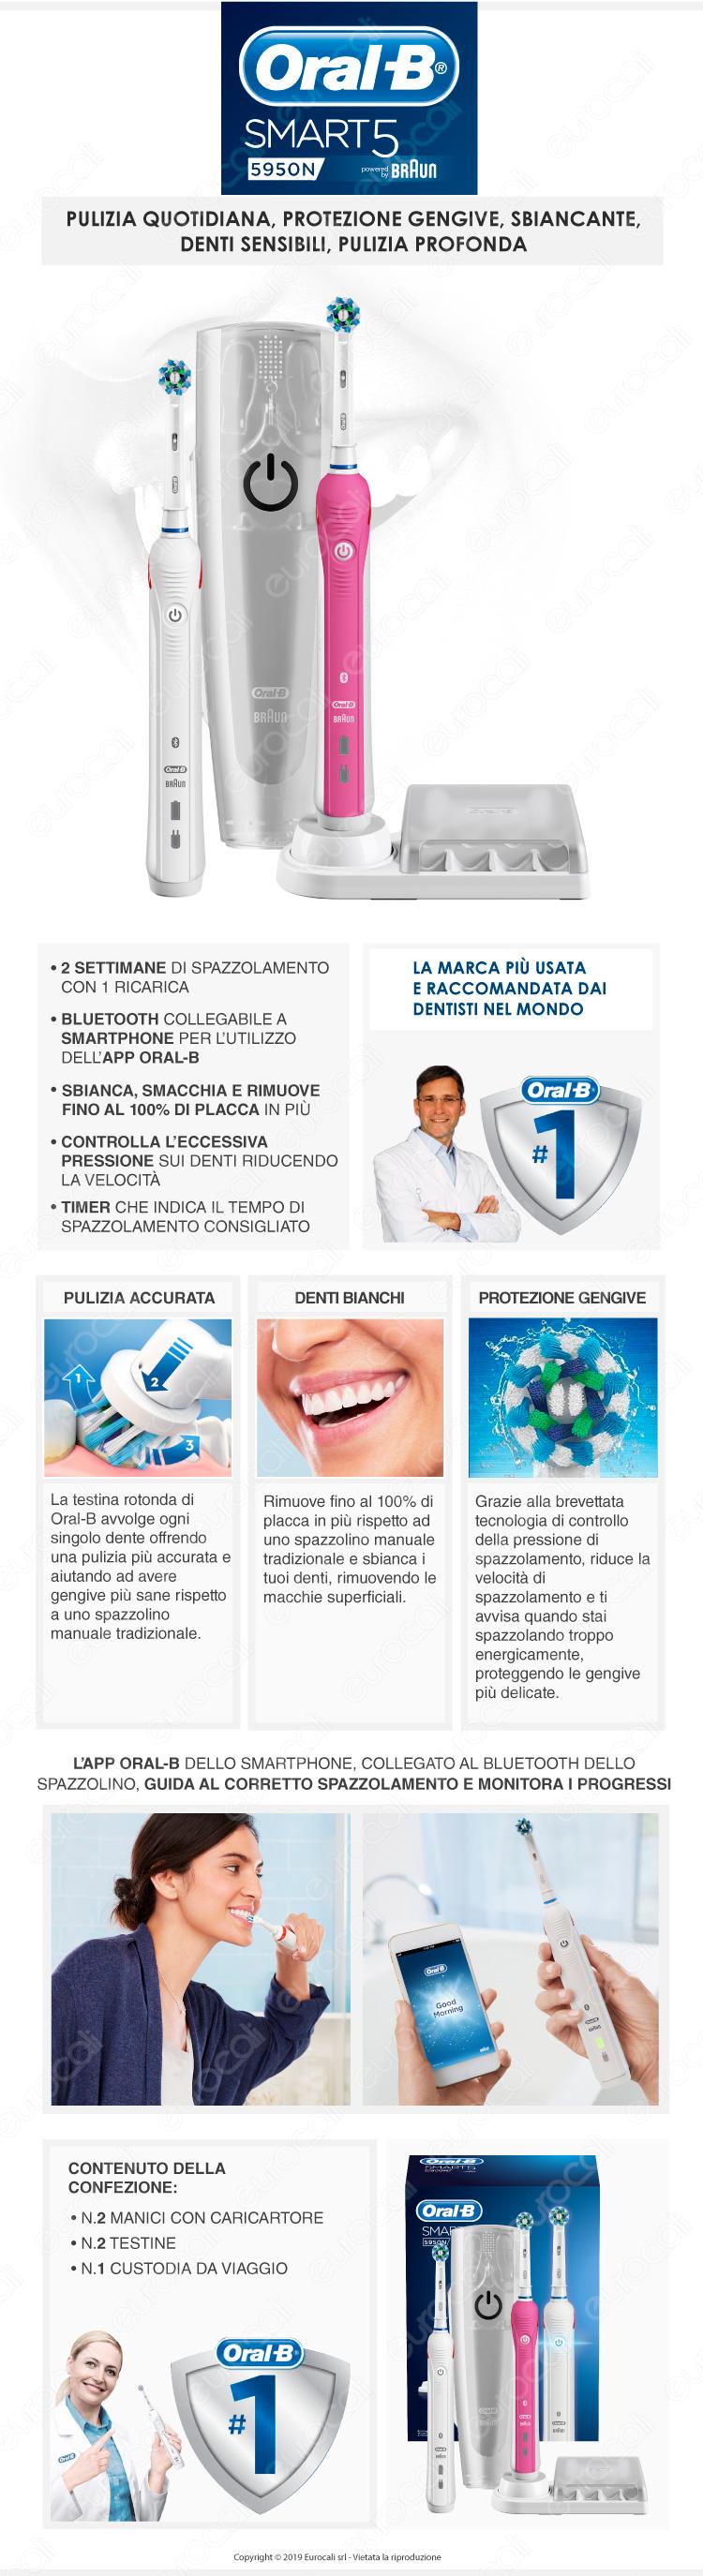 Oral-B Spazzolino Elettrico SmartSeries 5